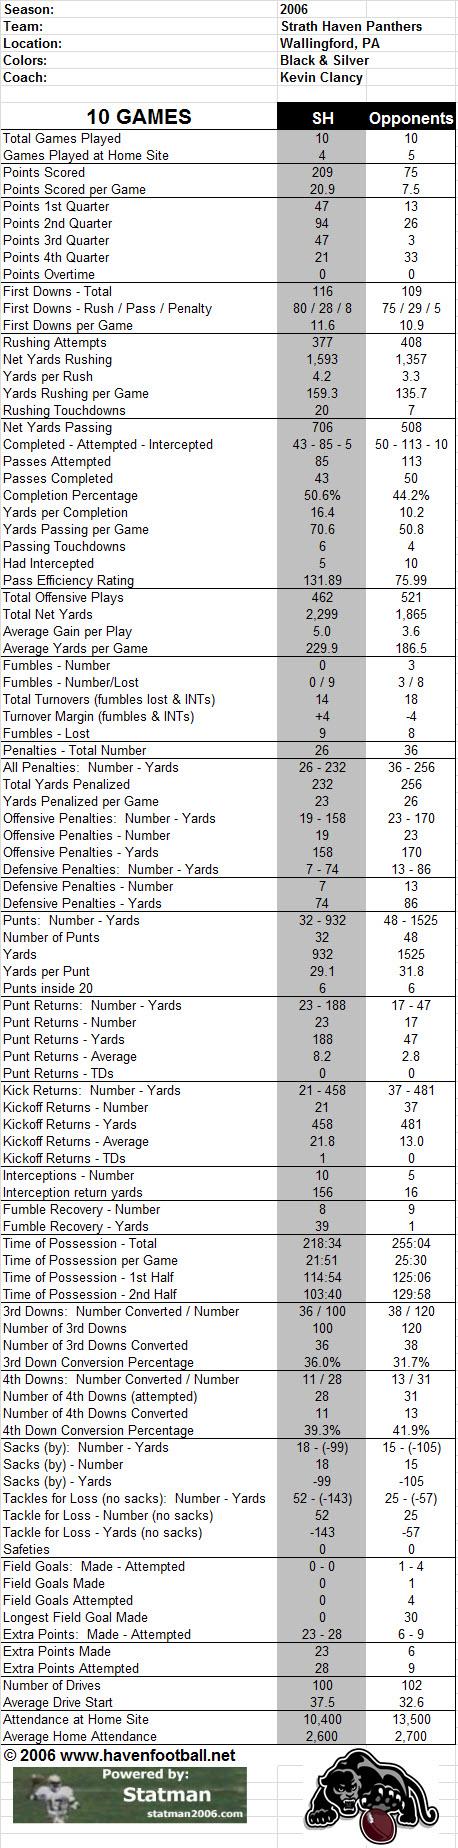 2006 Season Game Stats